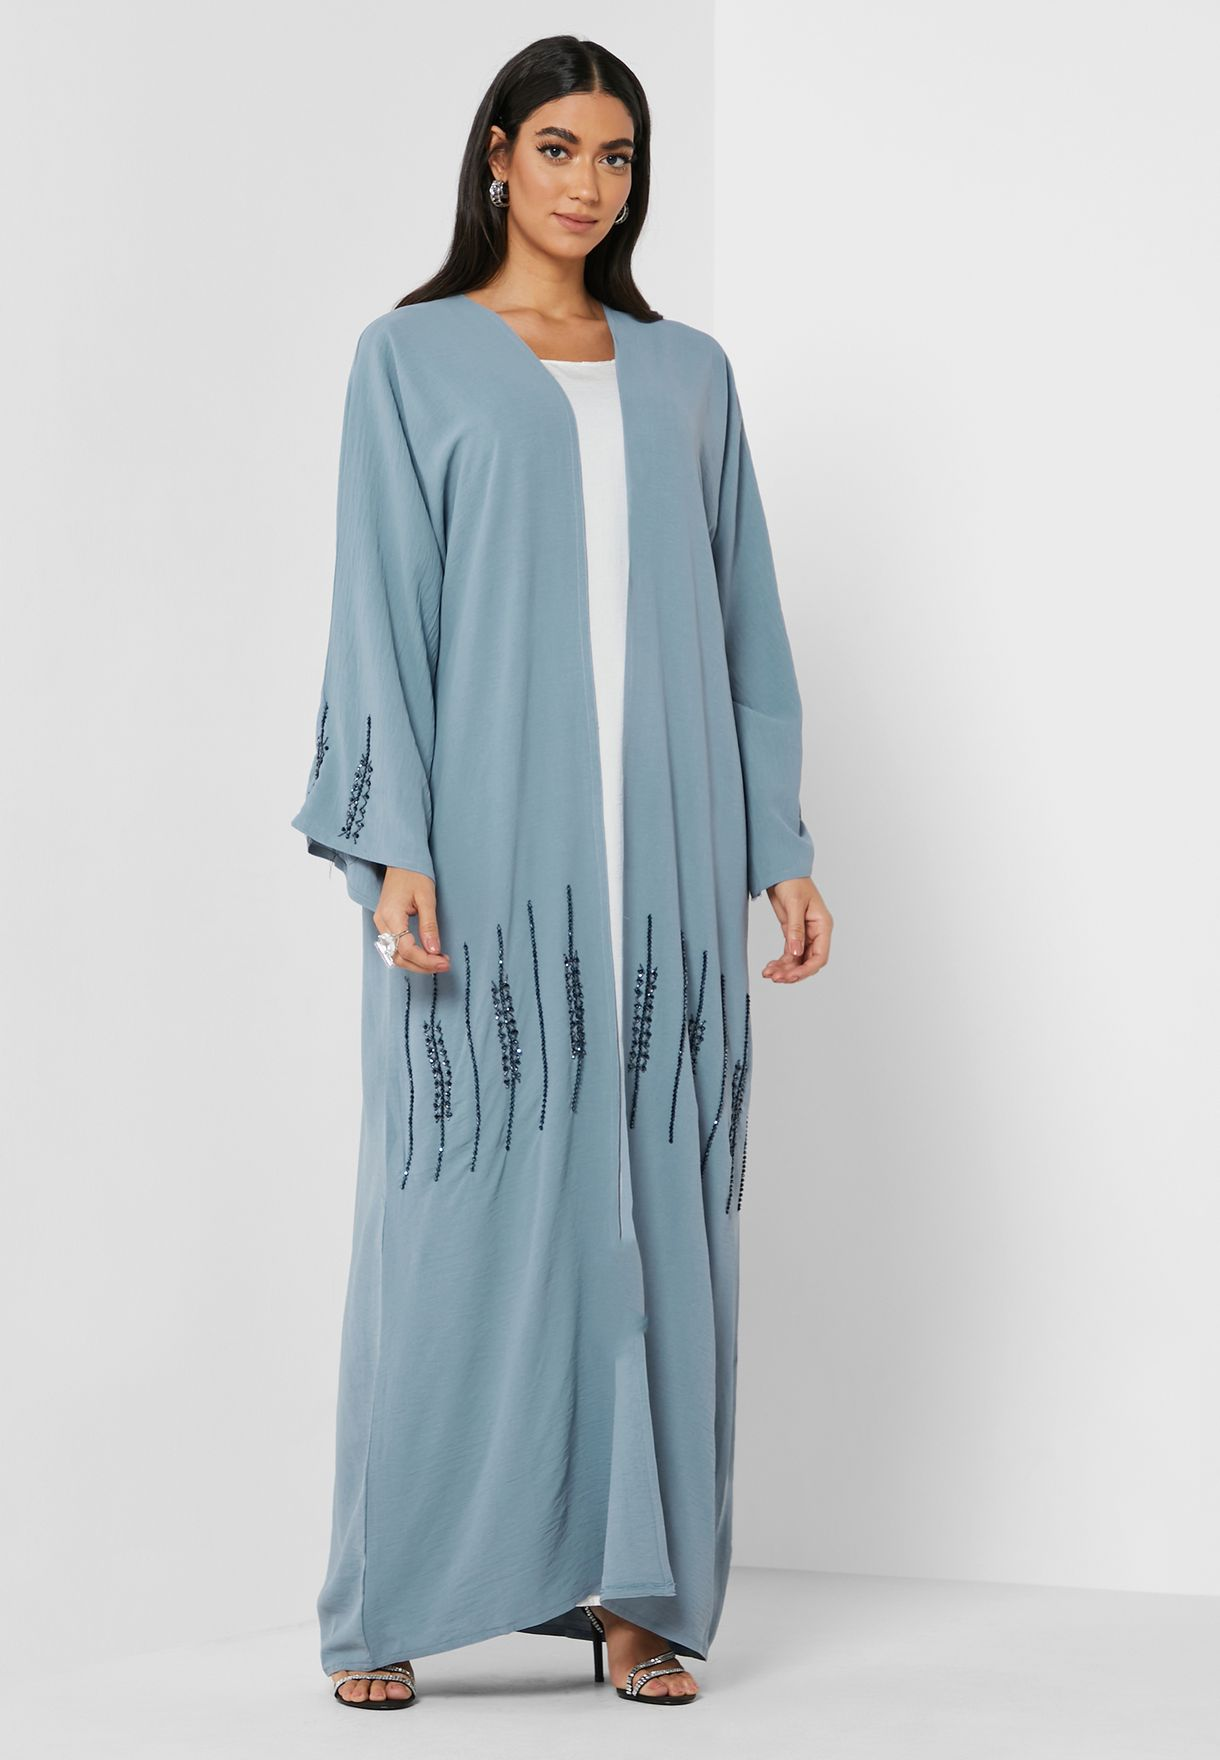 Colorblock Knitted Abaya